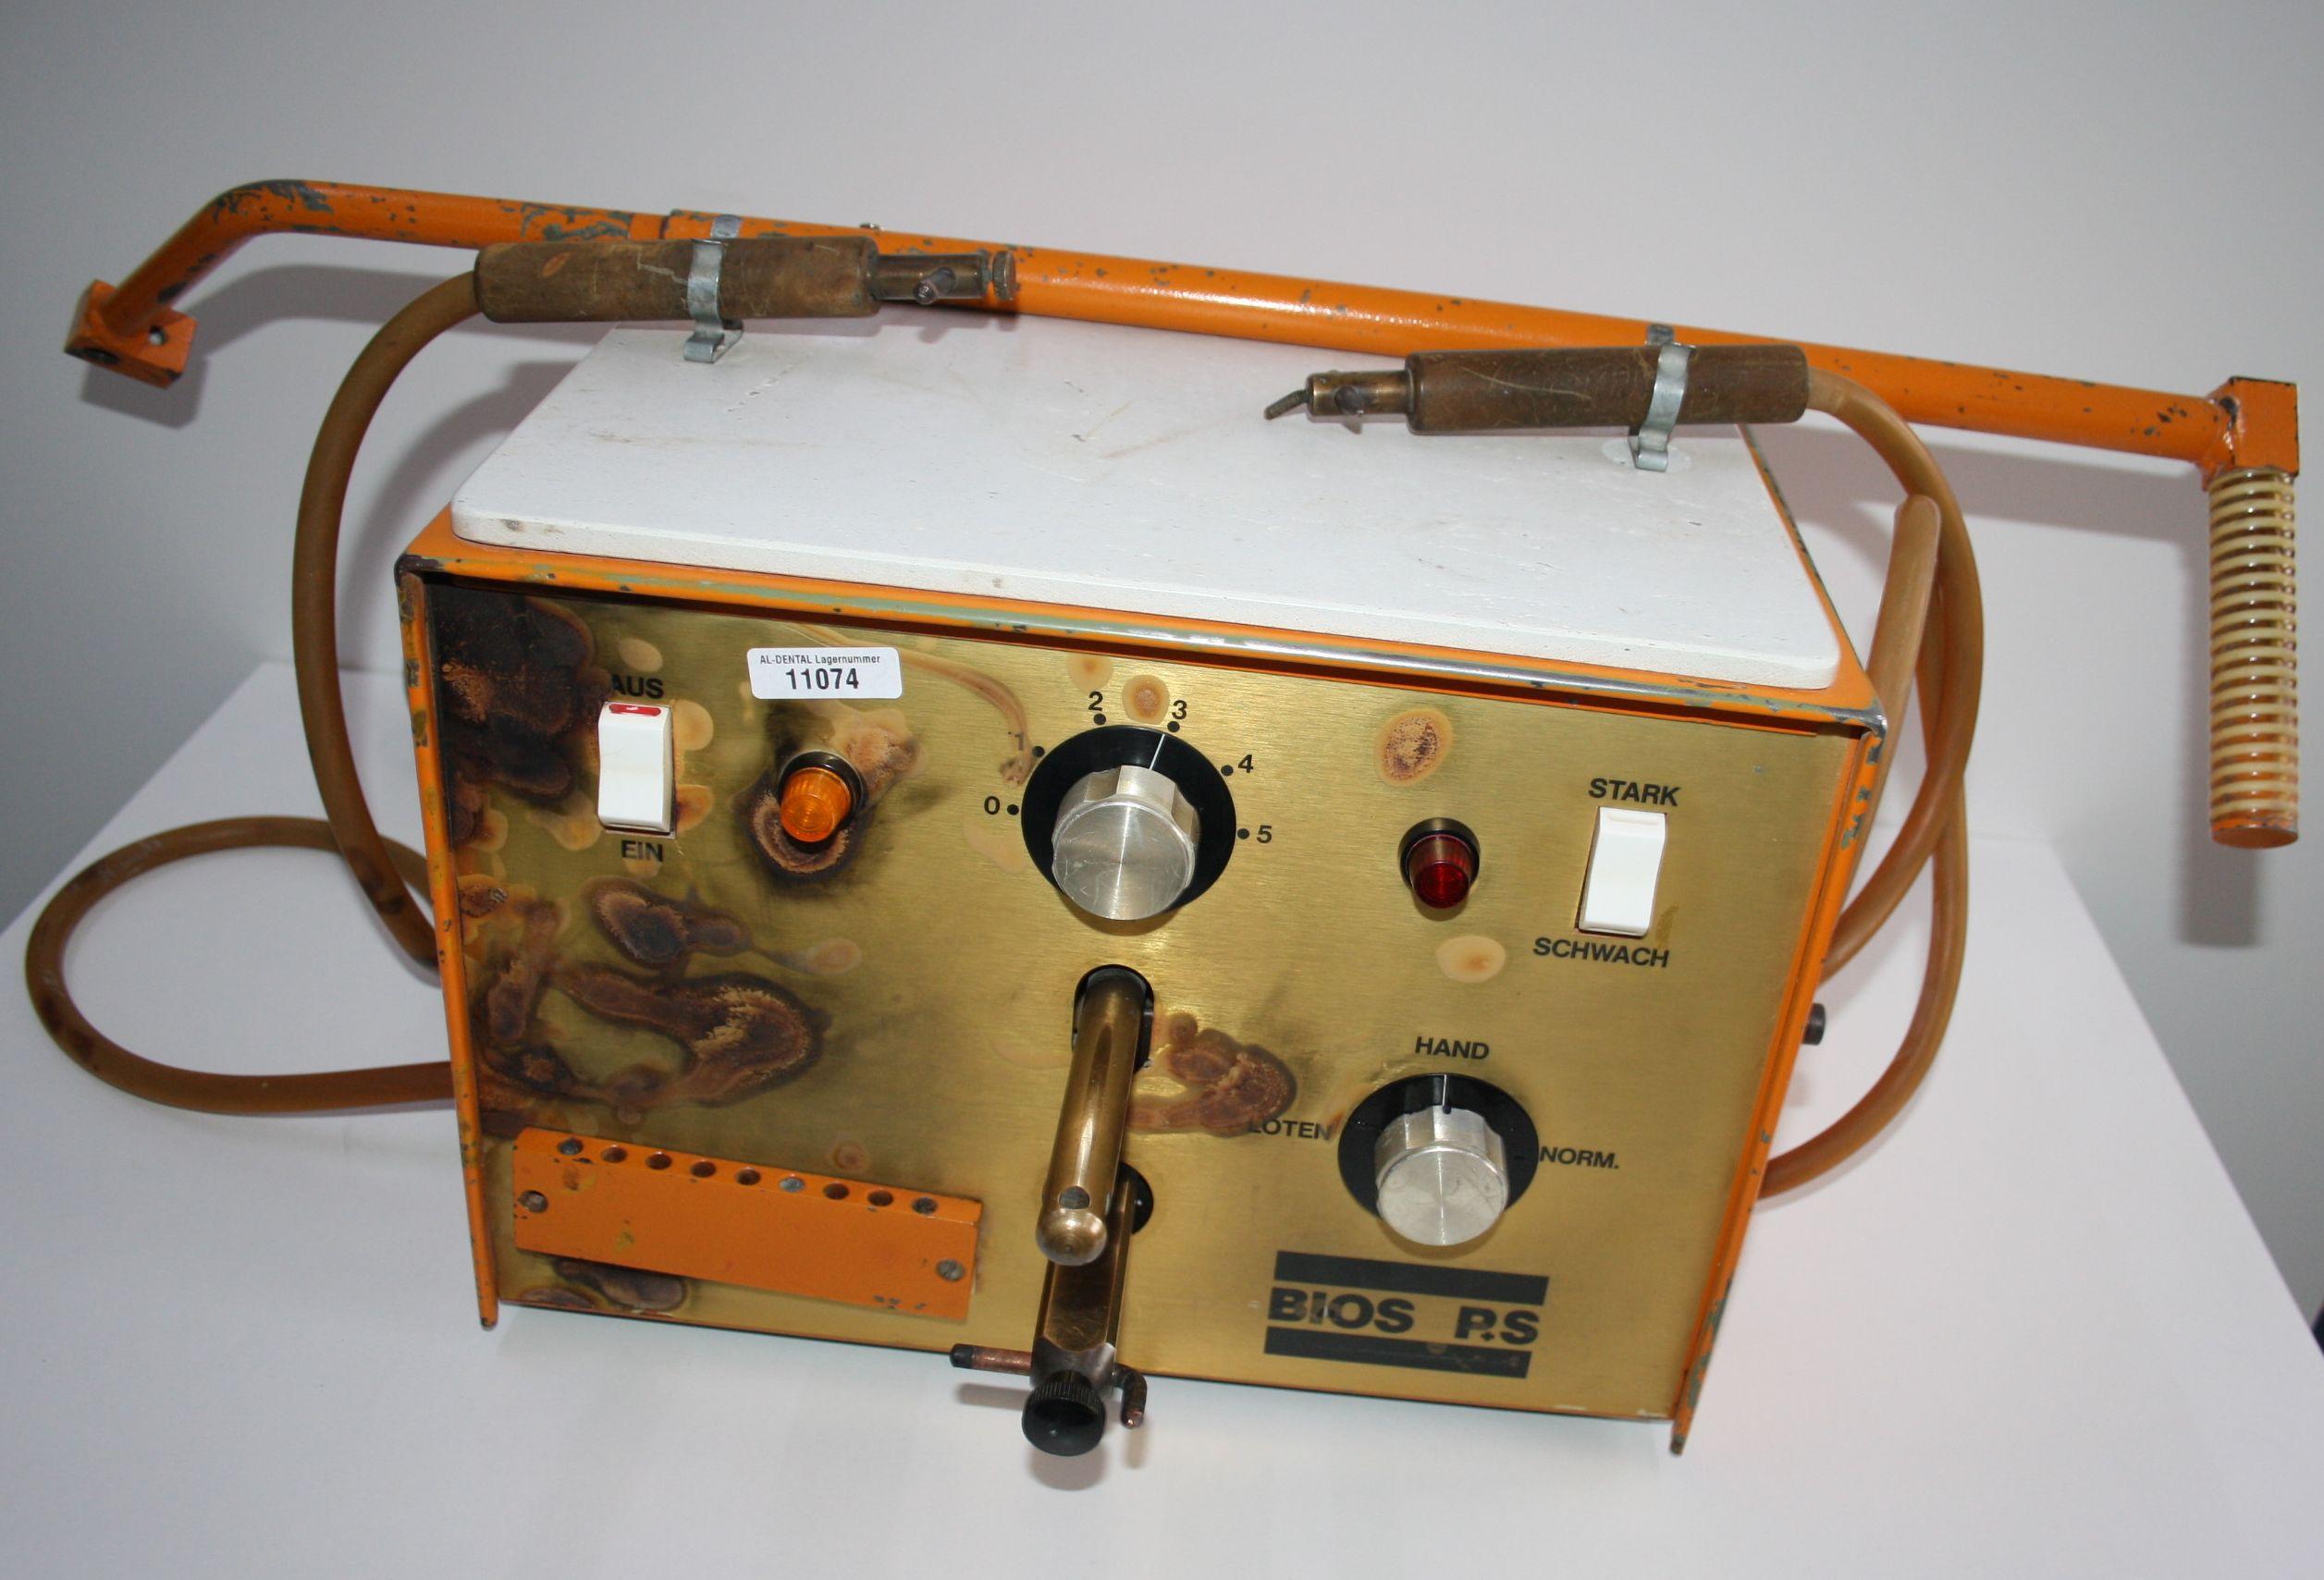 HERAEUS KULZER Druckpolymerisationsgerät Palamat practic EL T # 11047